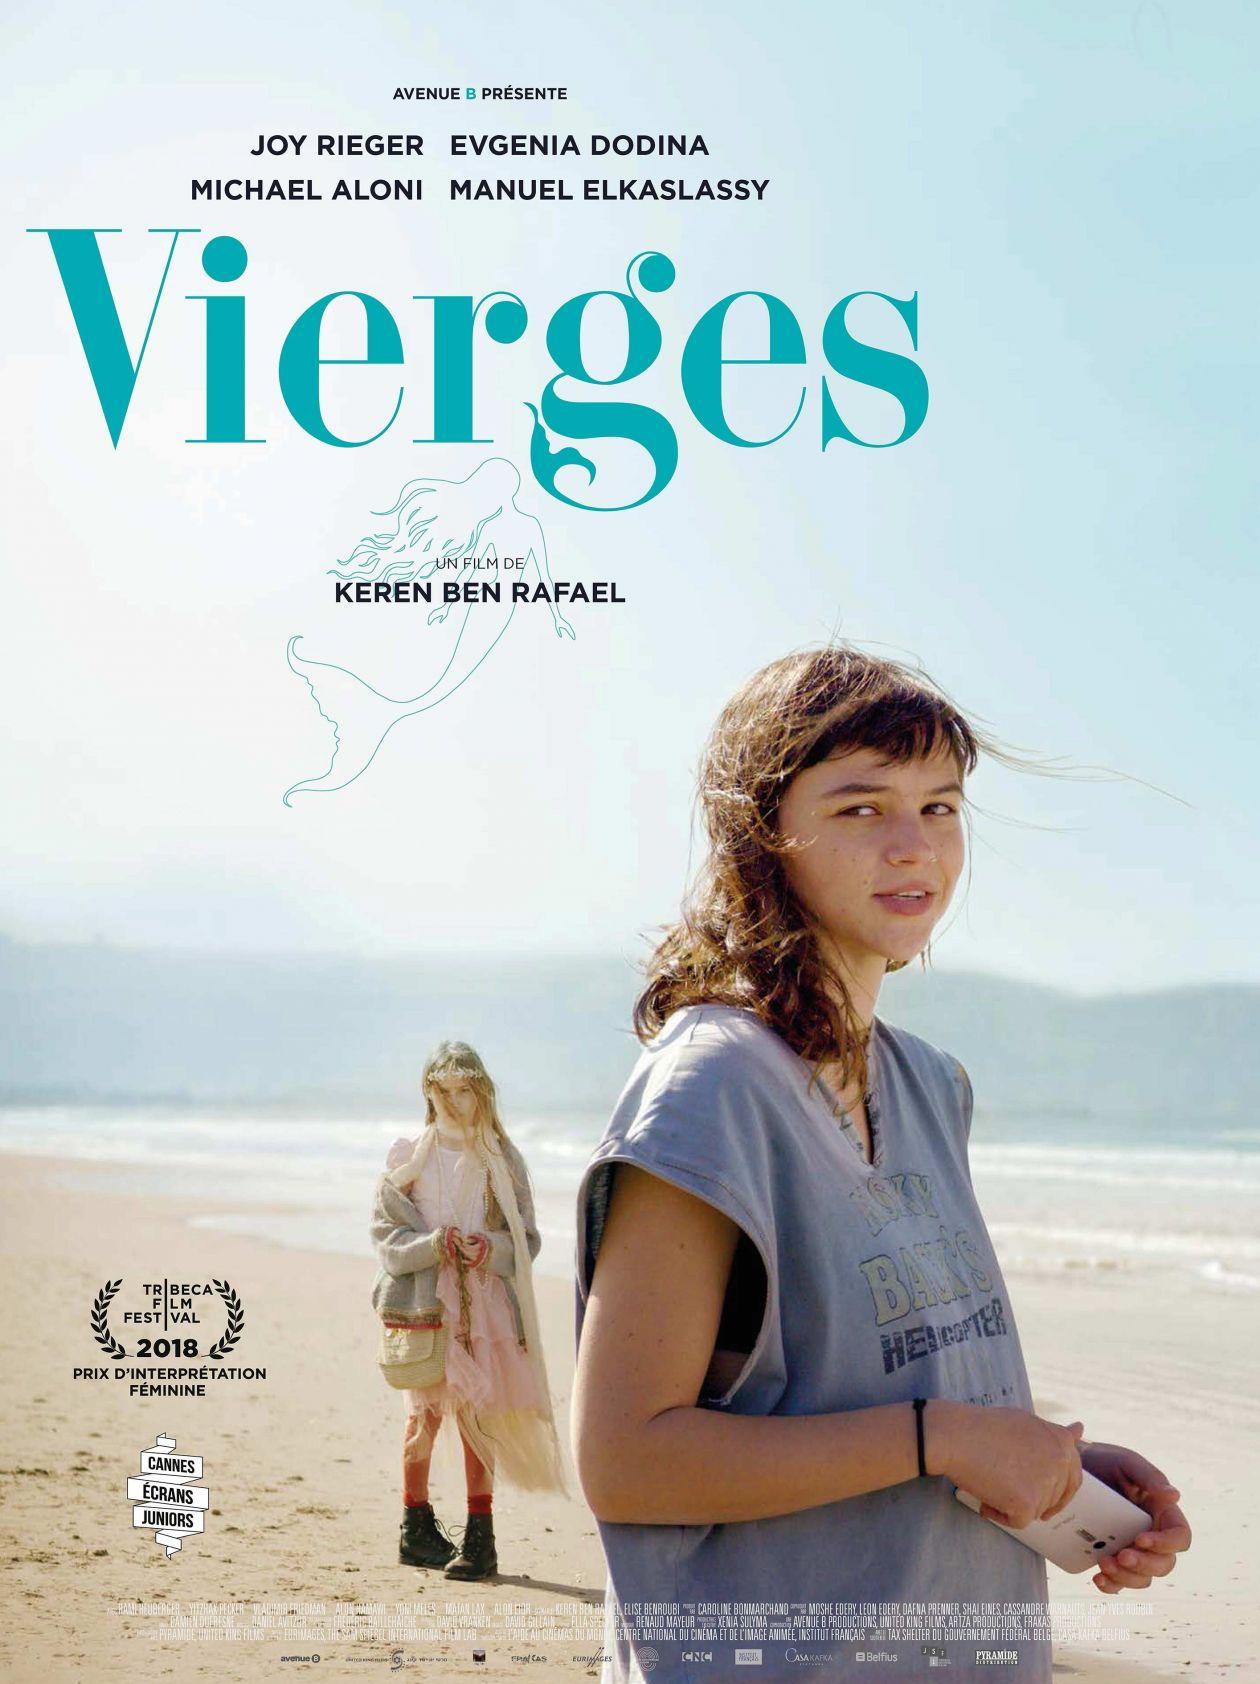 Joy Rieger / Lana | Vierges / Virgins / אין בתולות בקריות | Keren Ben Rafael